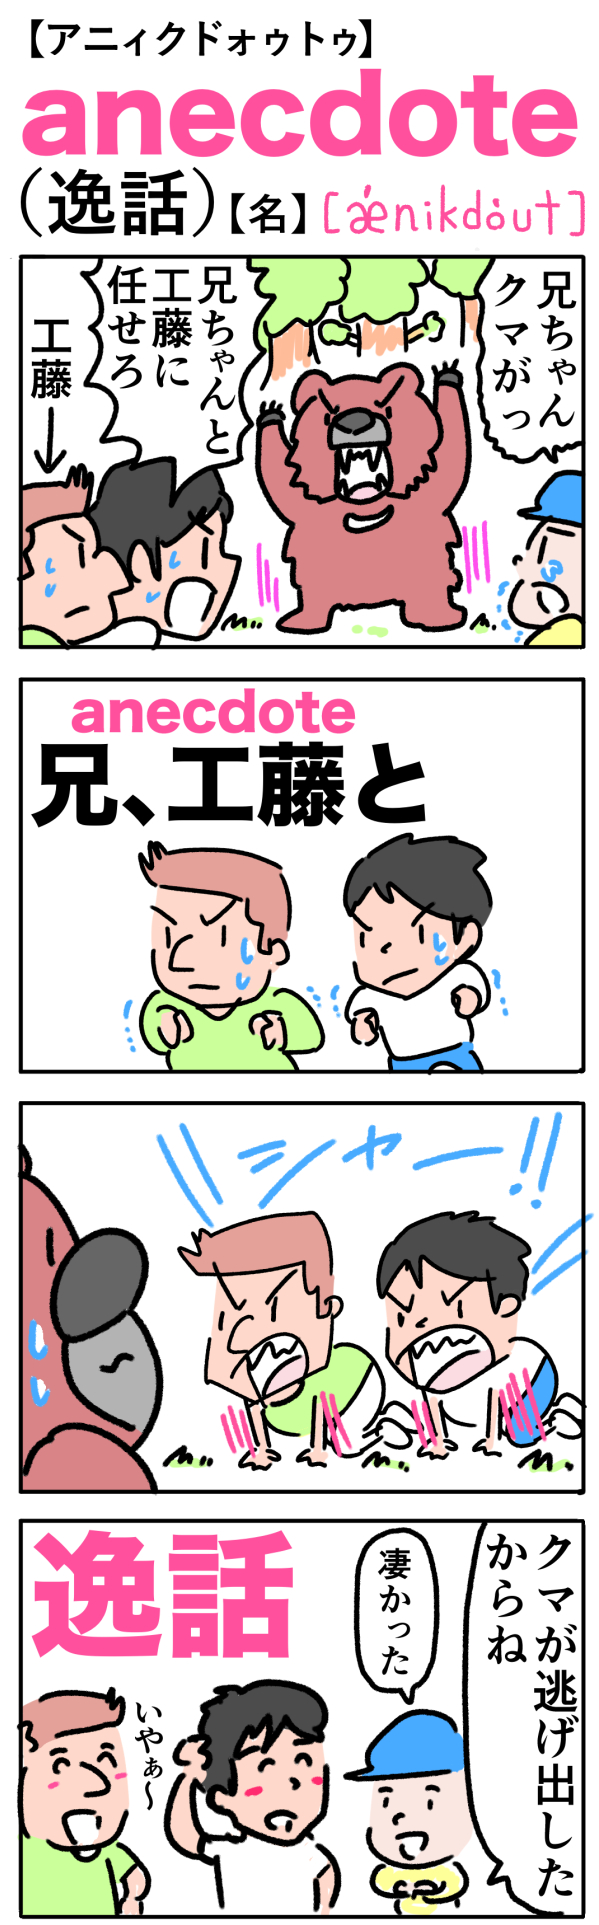 anecdote(逸話)の語呂合わせ英単語